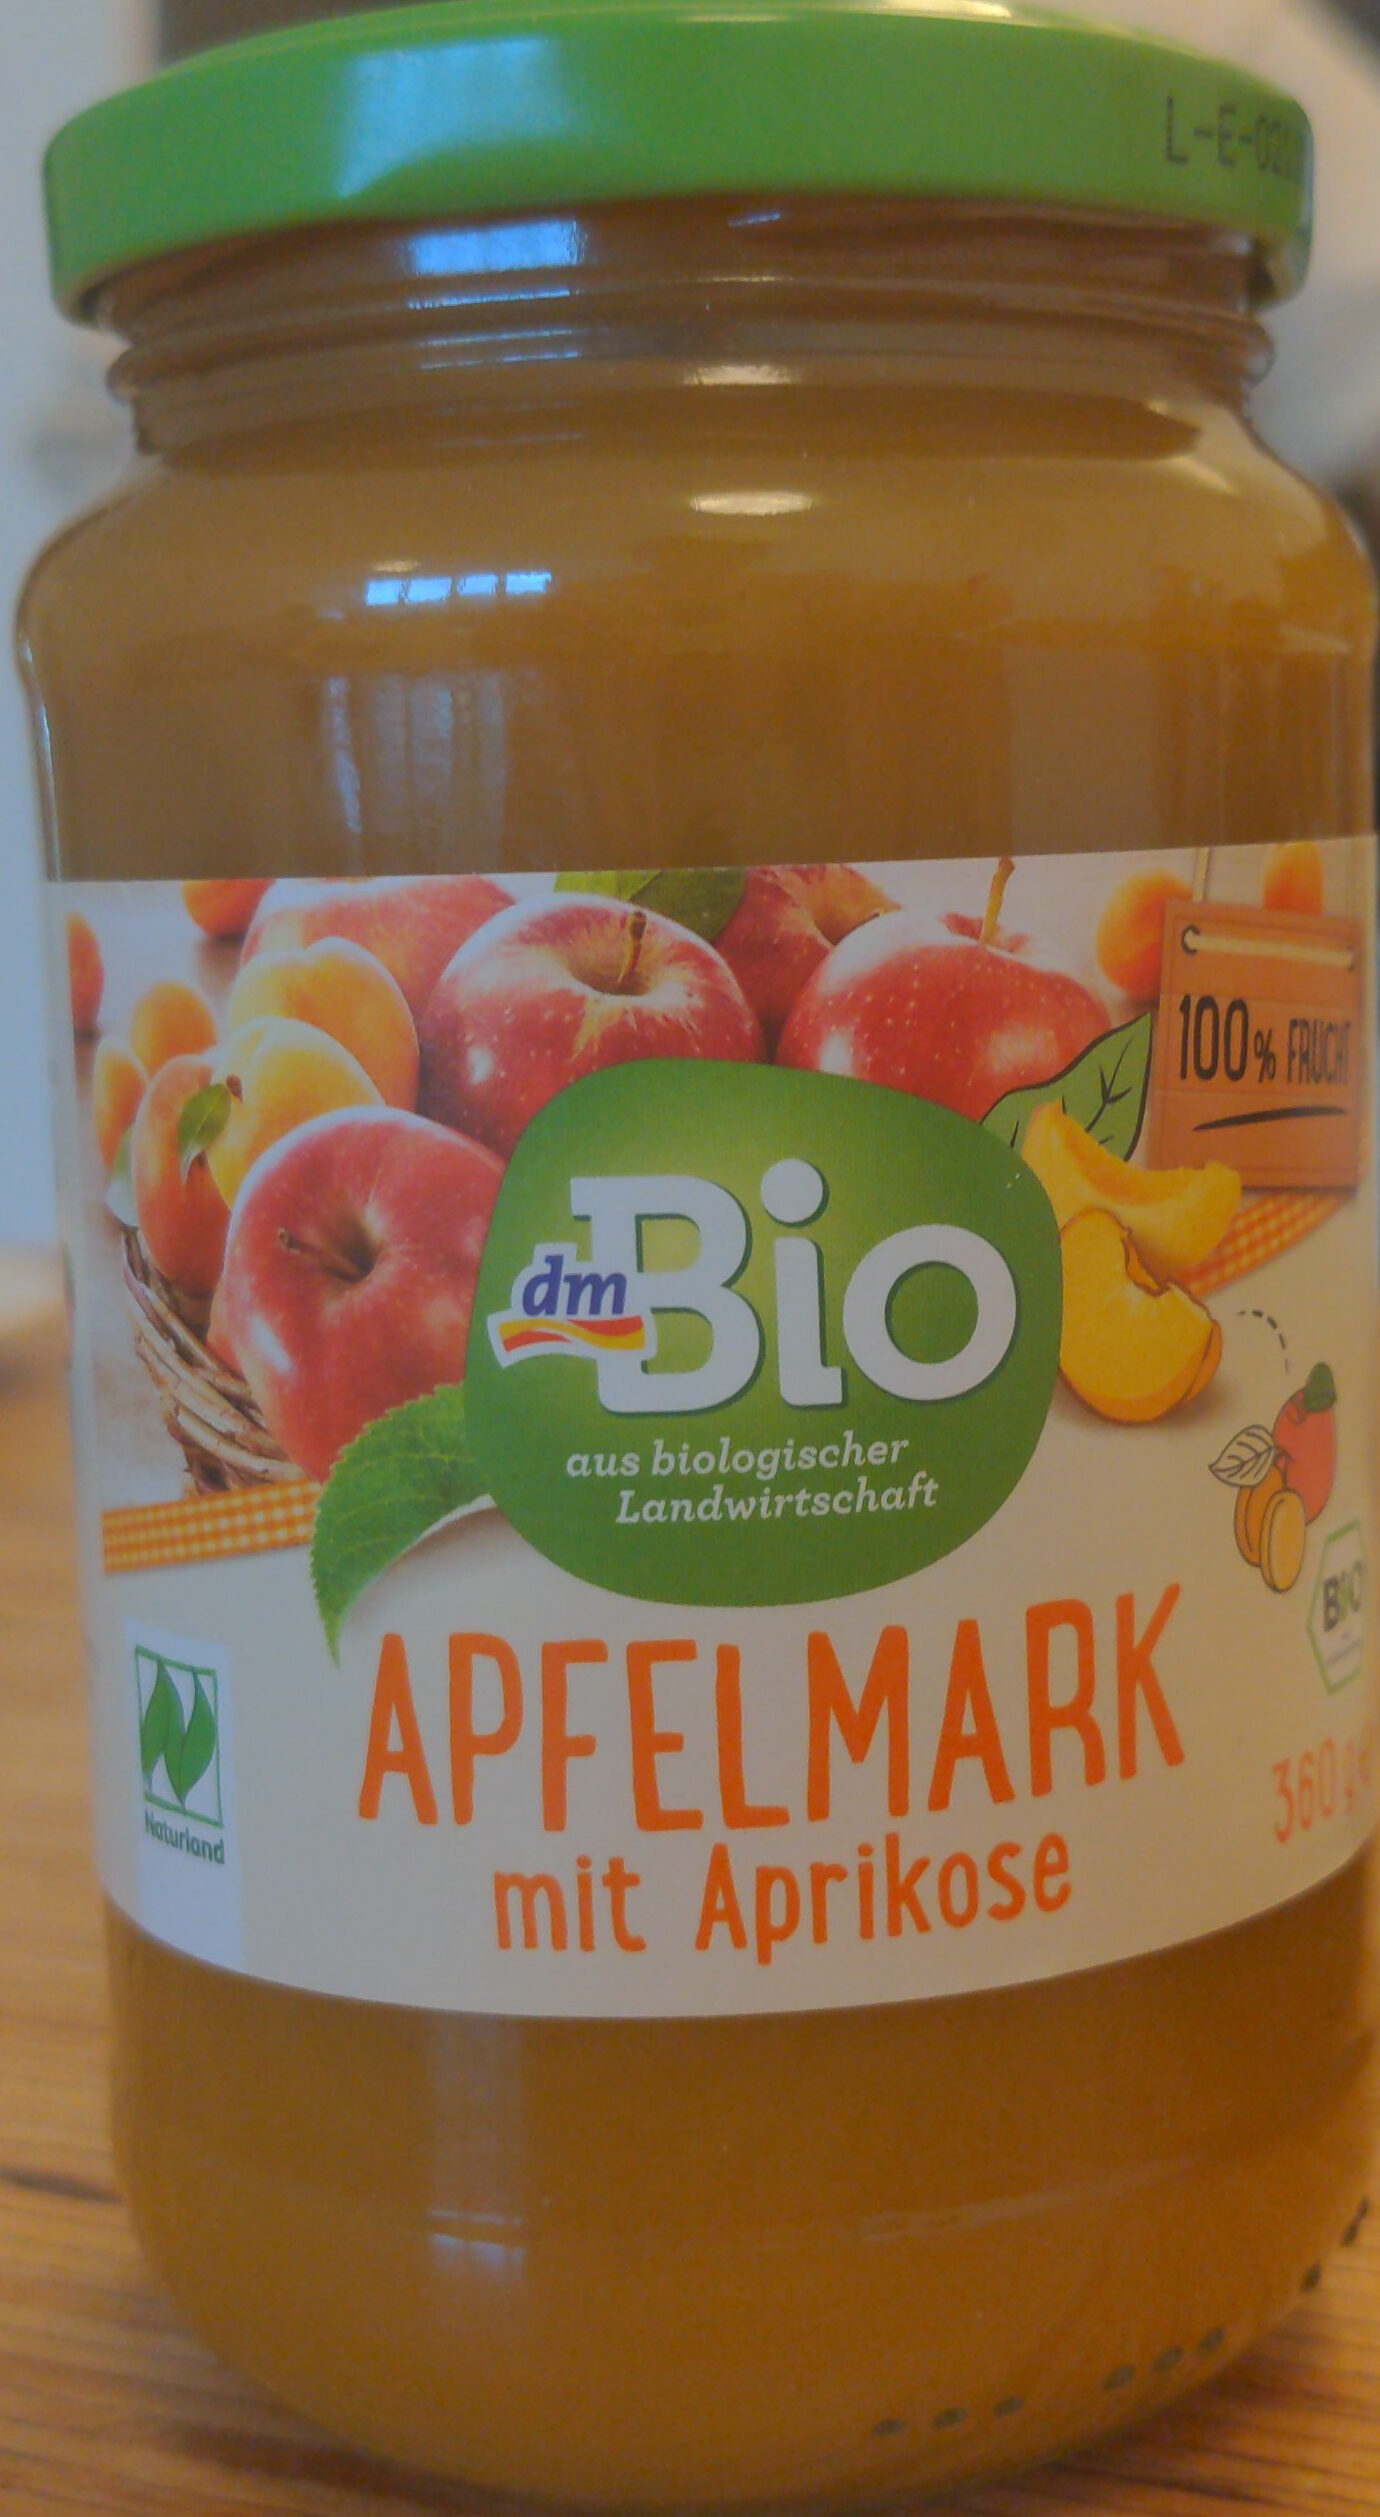 Apfelmark mit Aprikose - Prodotto - de